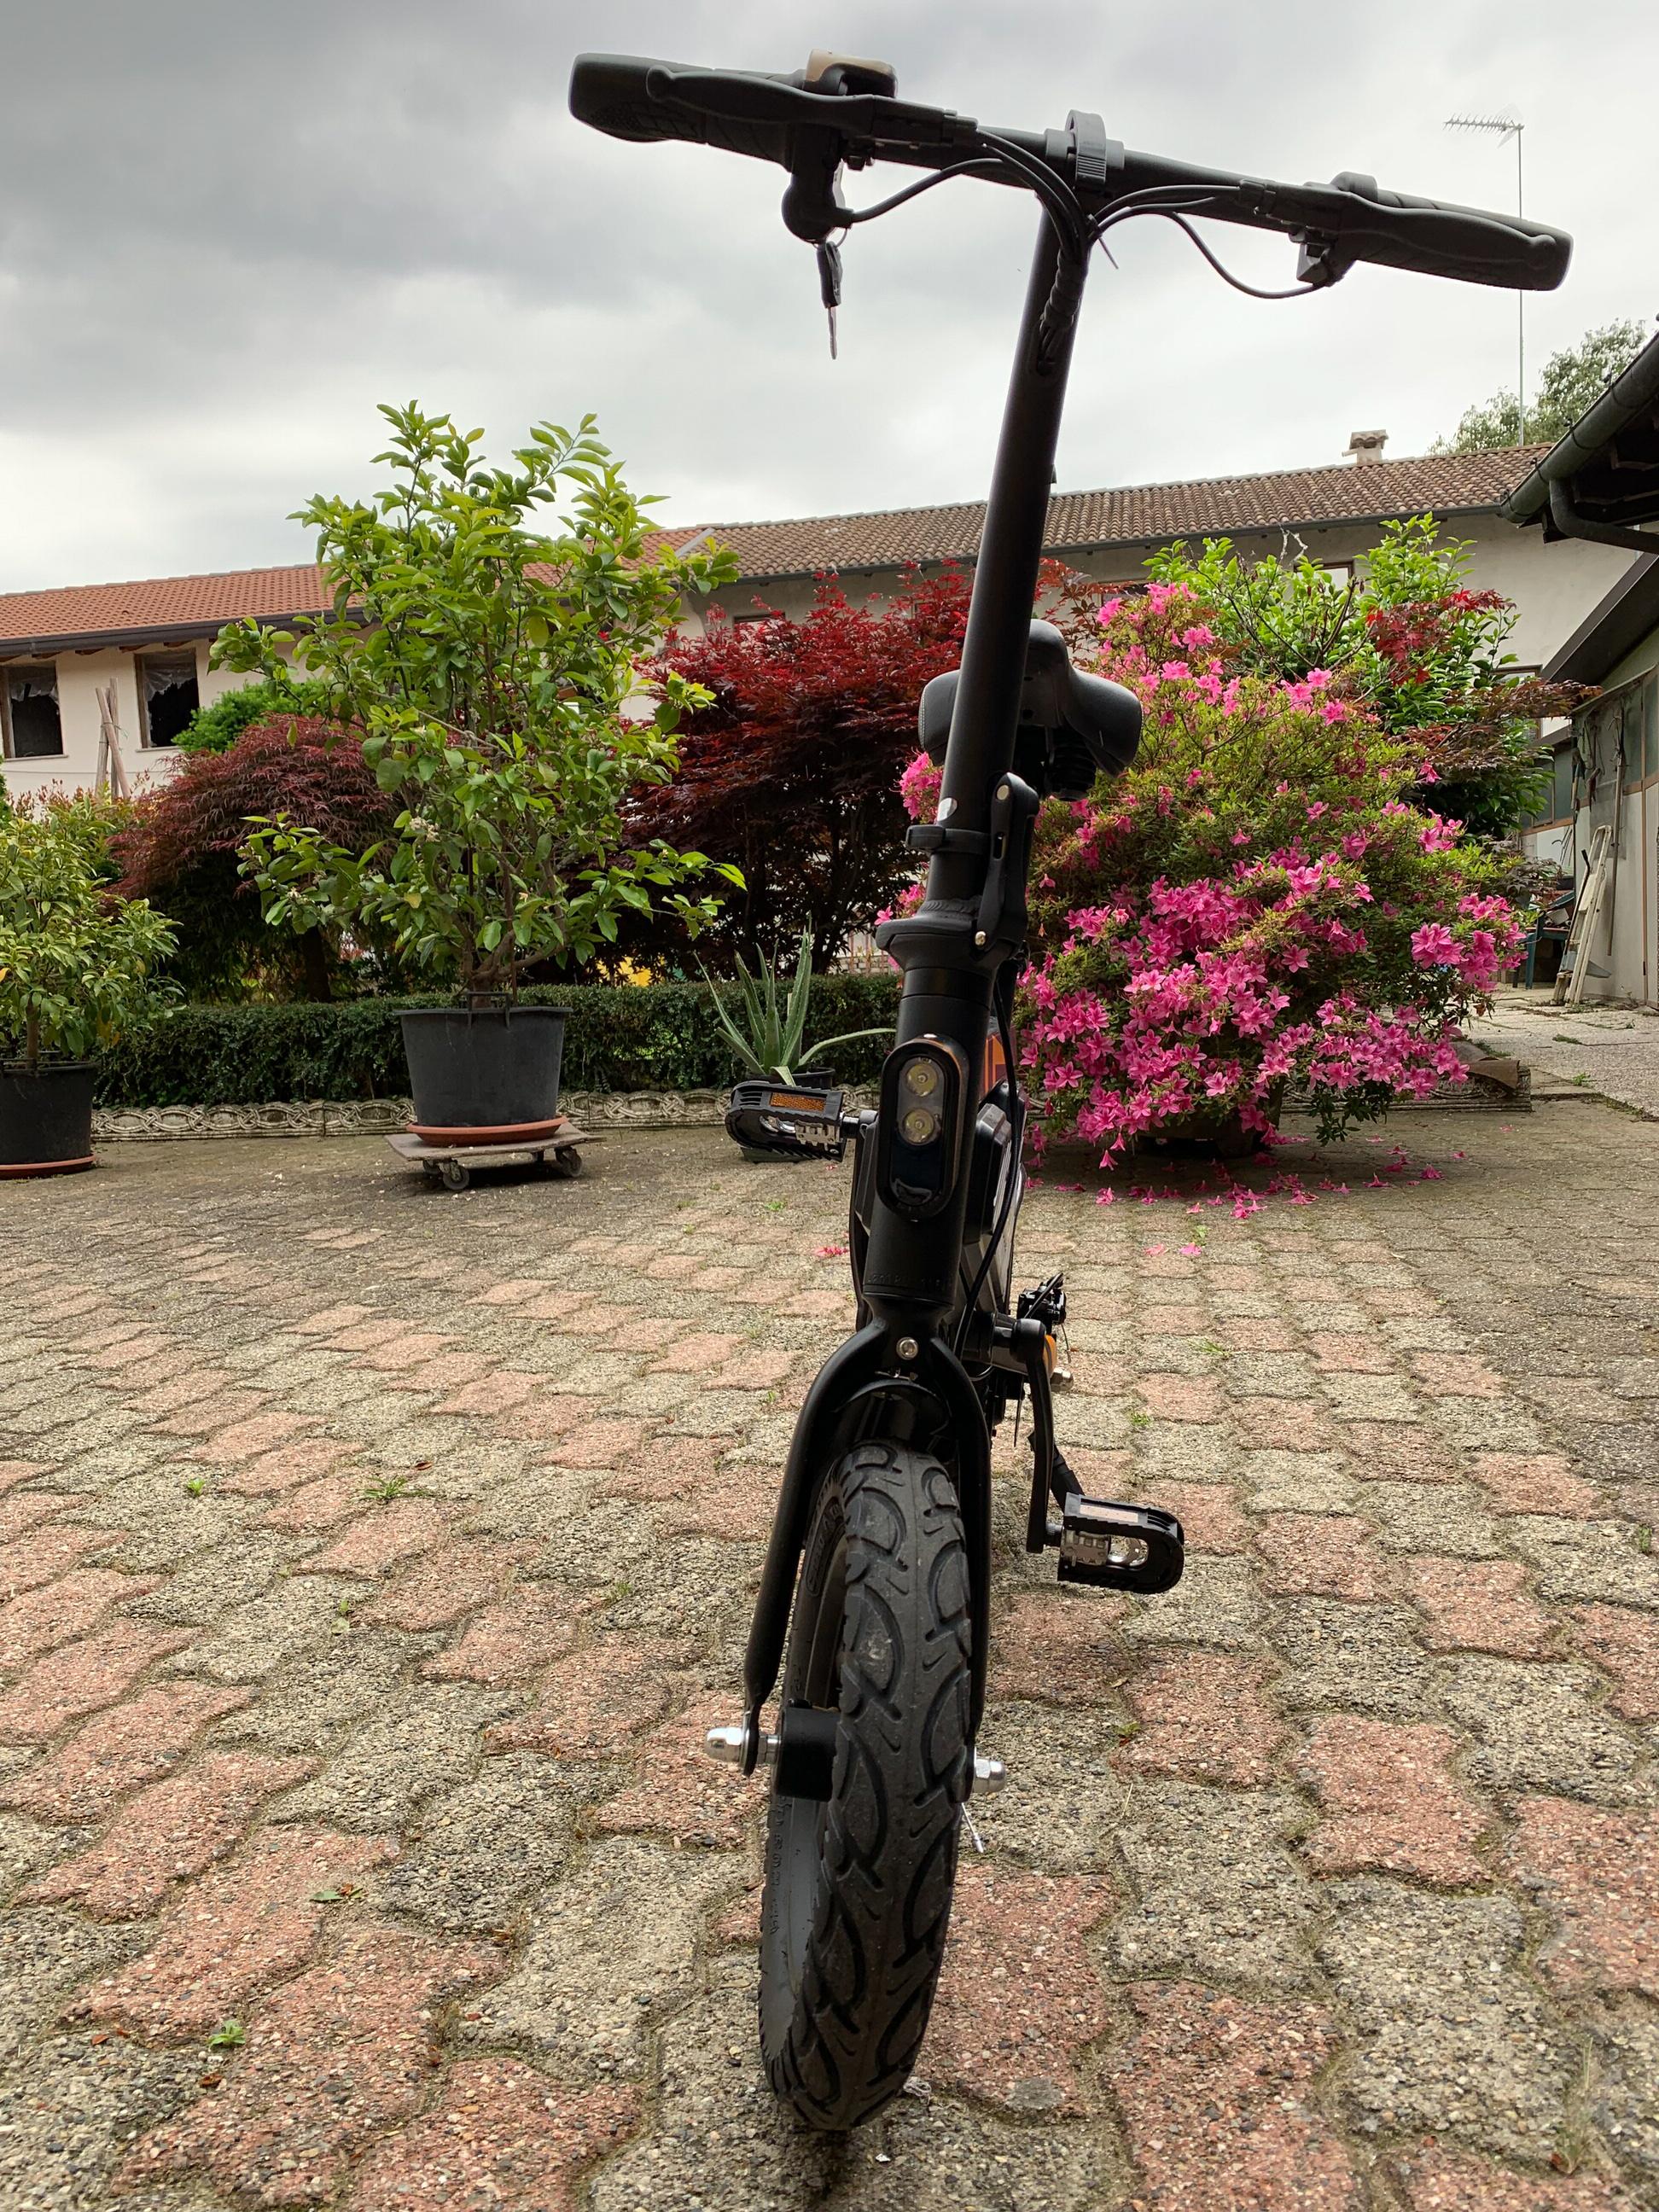 Recensione ZiYouJiGuang T18, lo scooter elettrico che voleva essere una bici